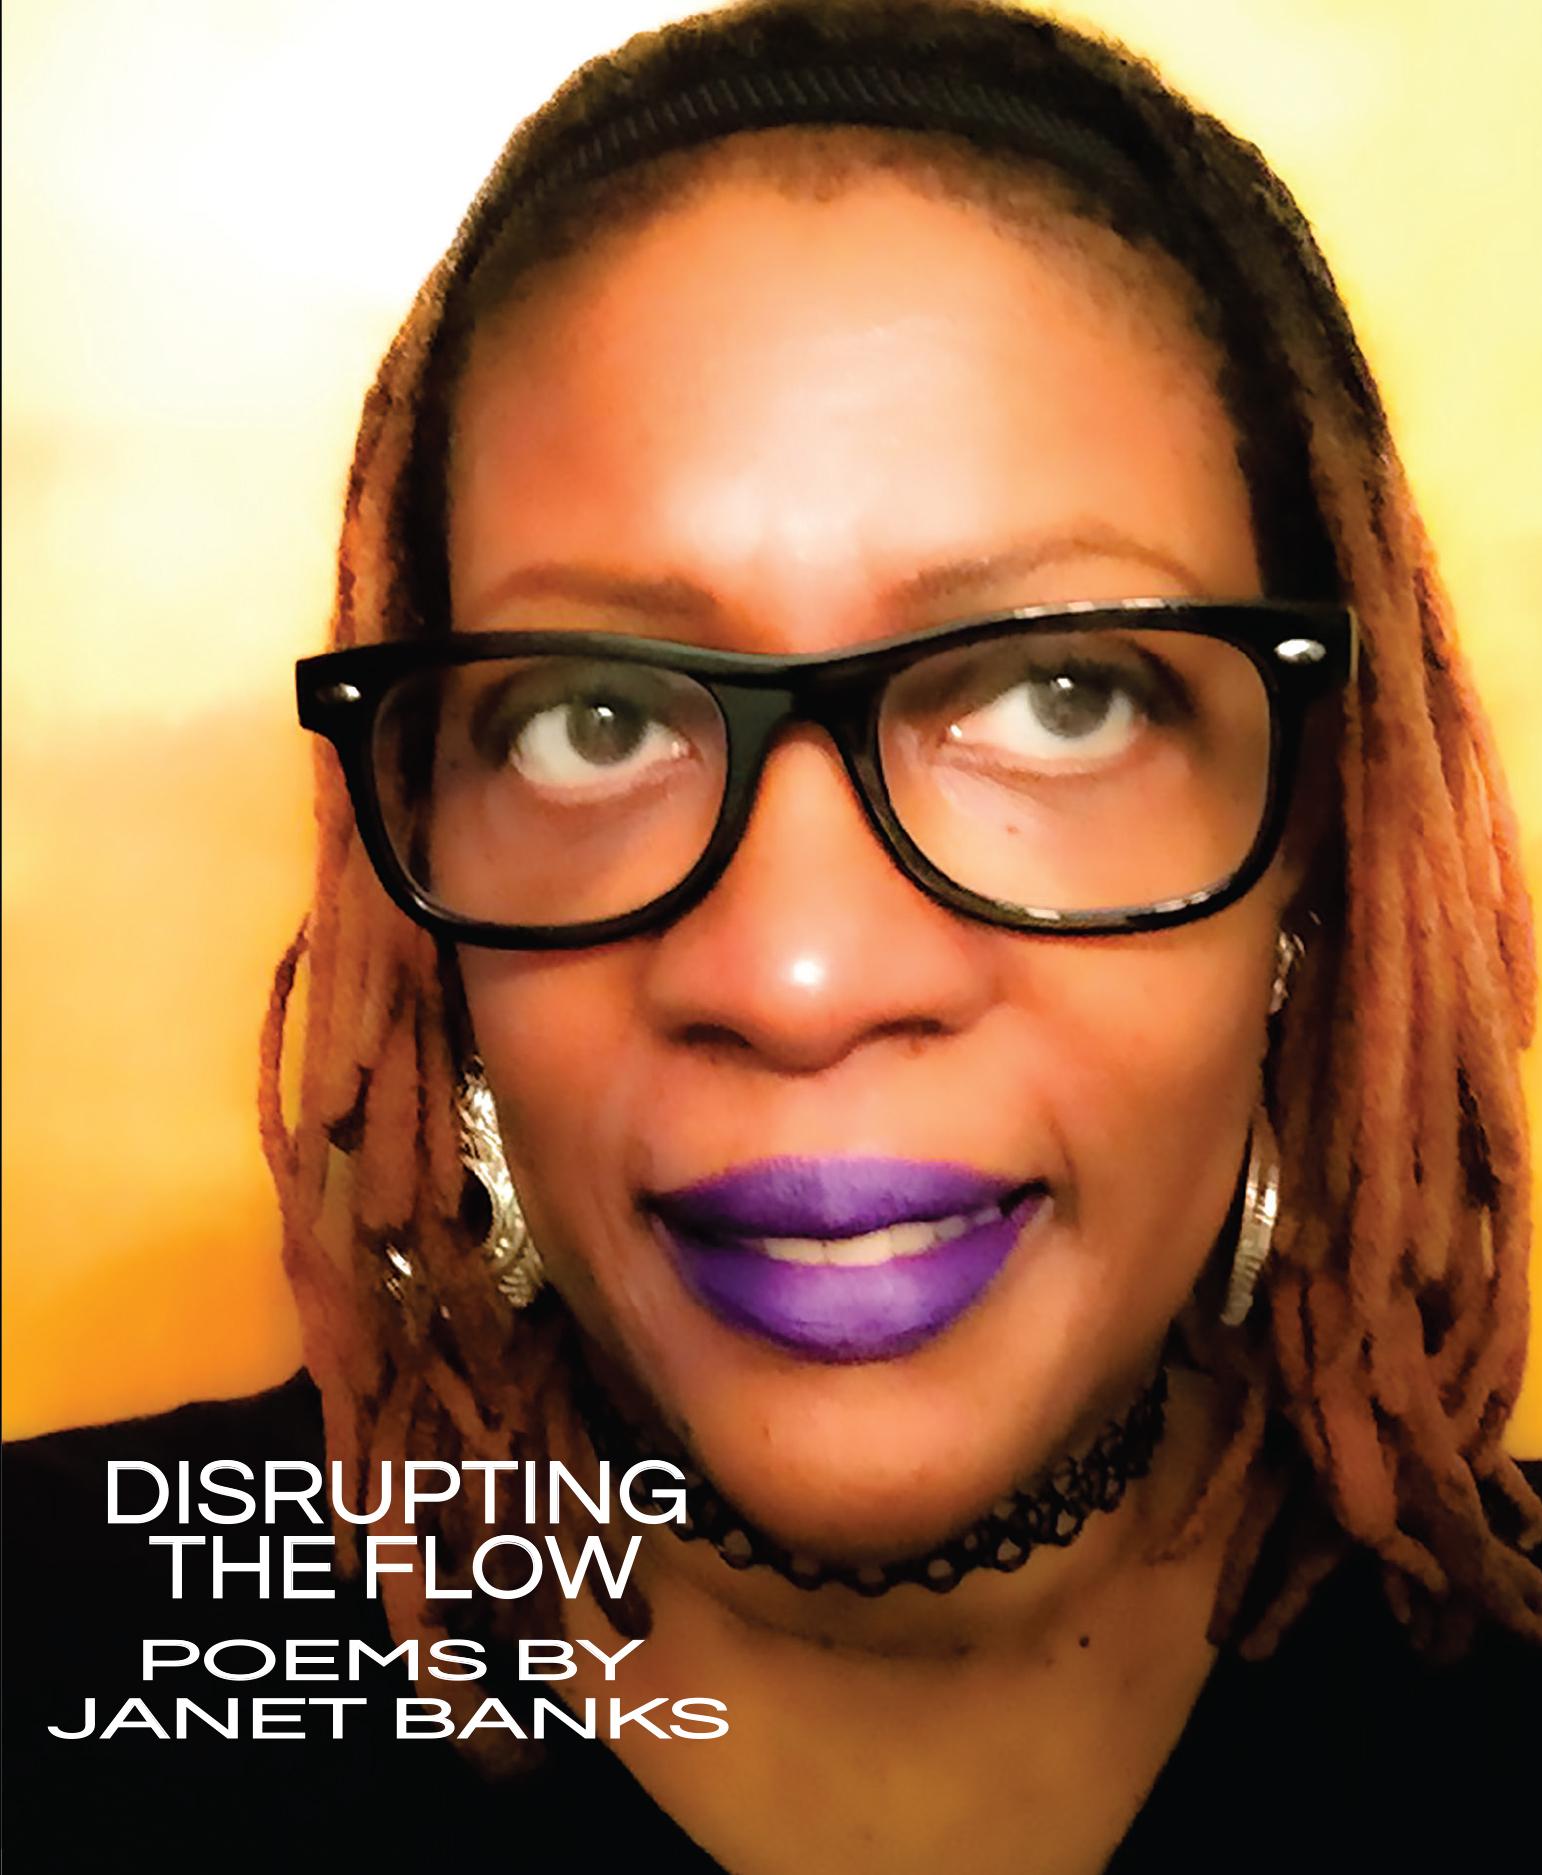 Disrupting the Flow